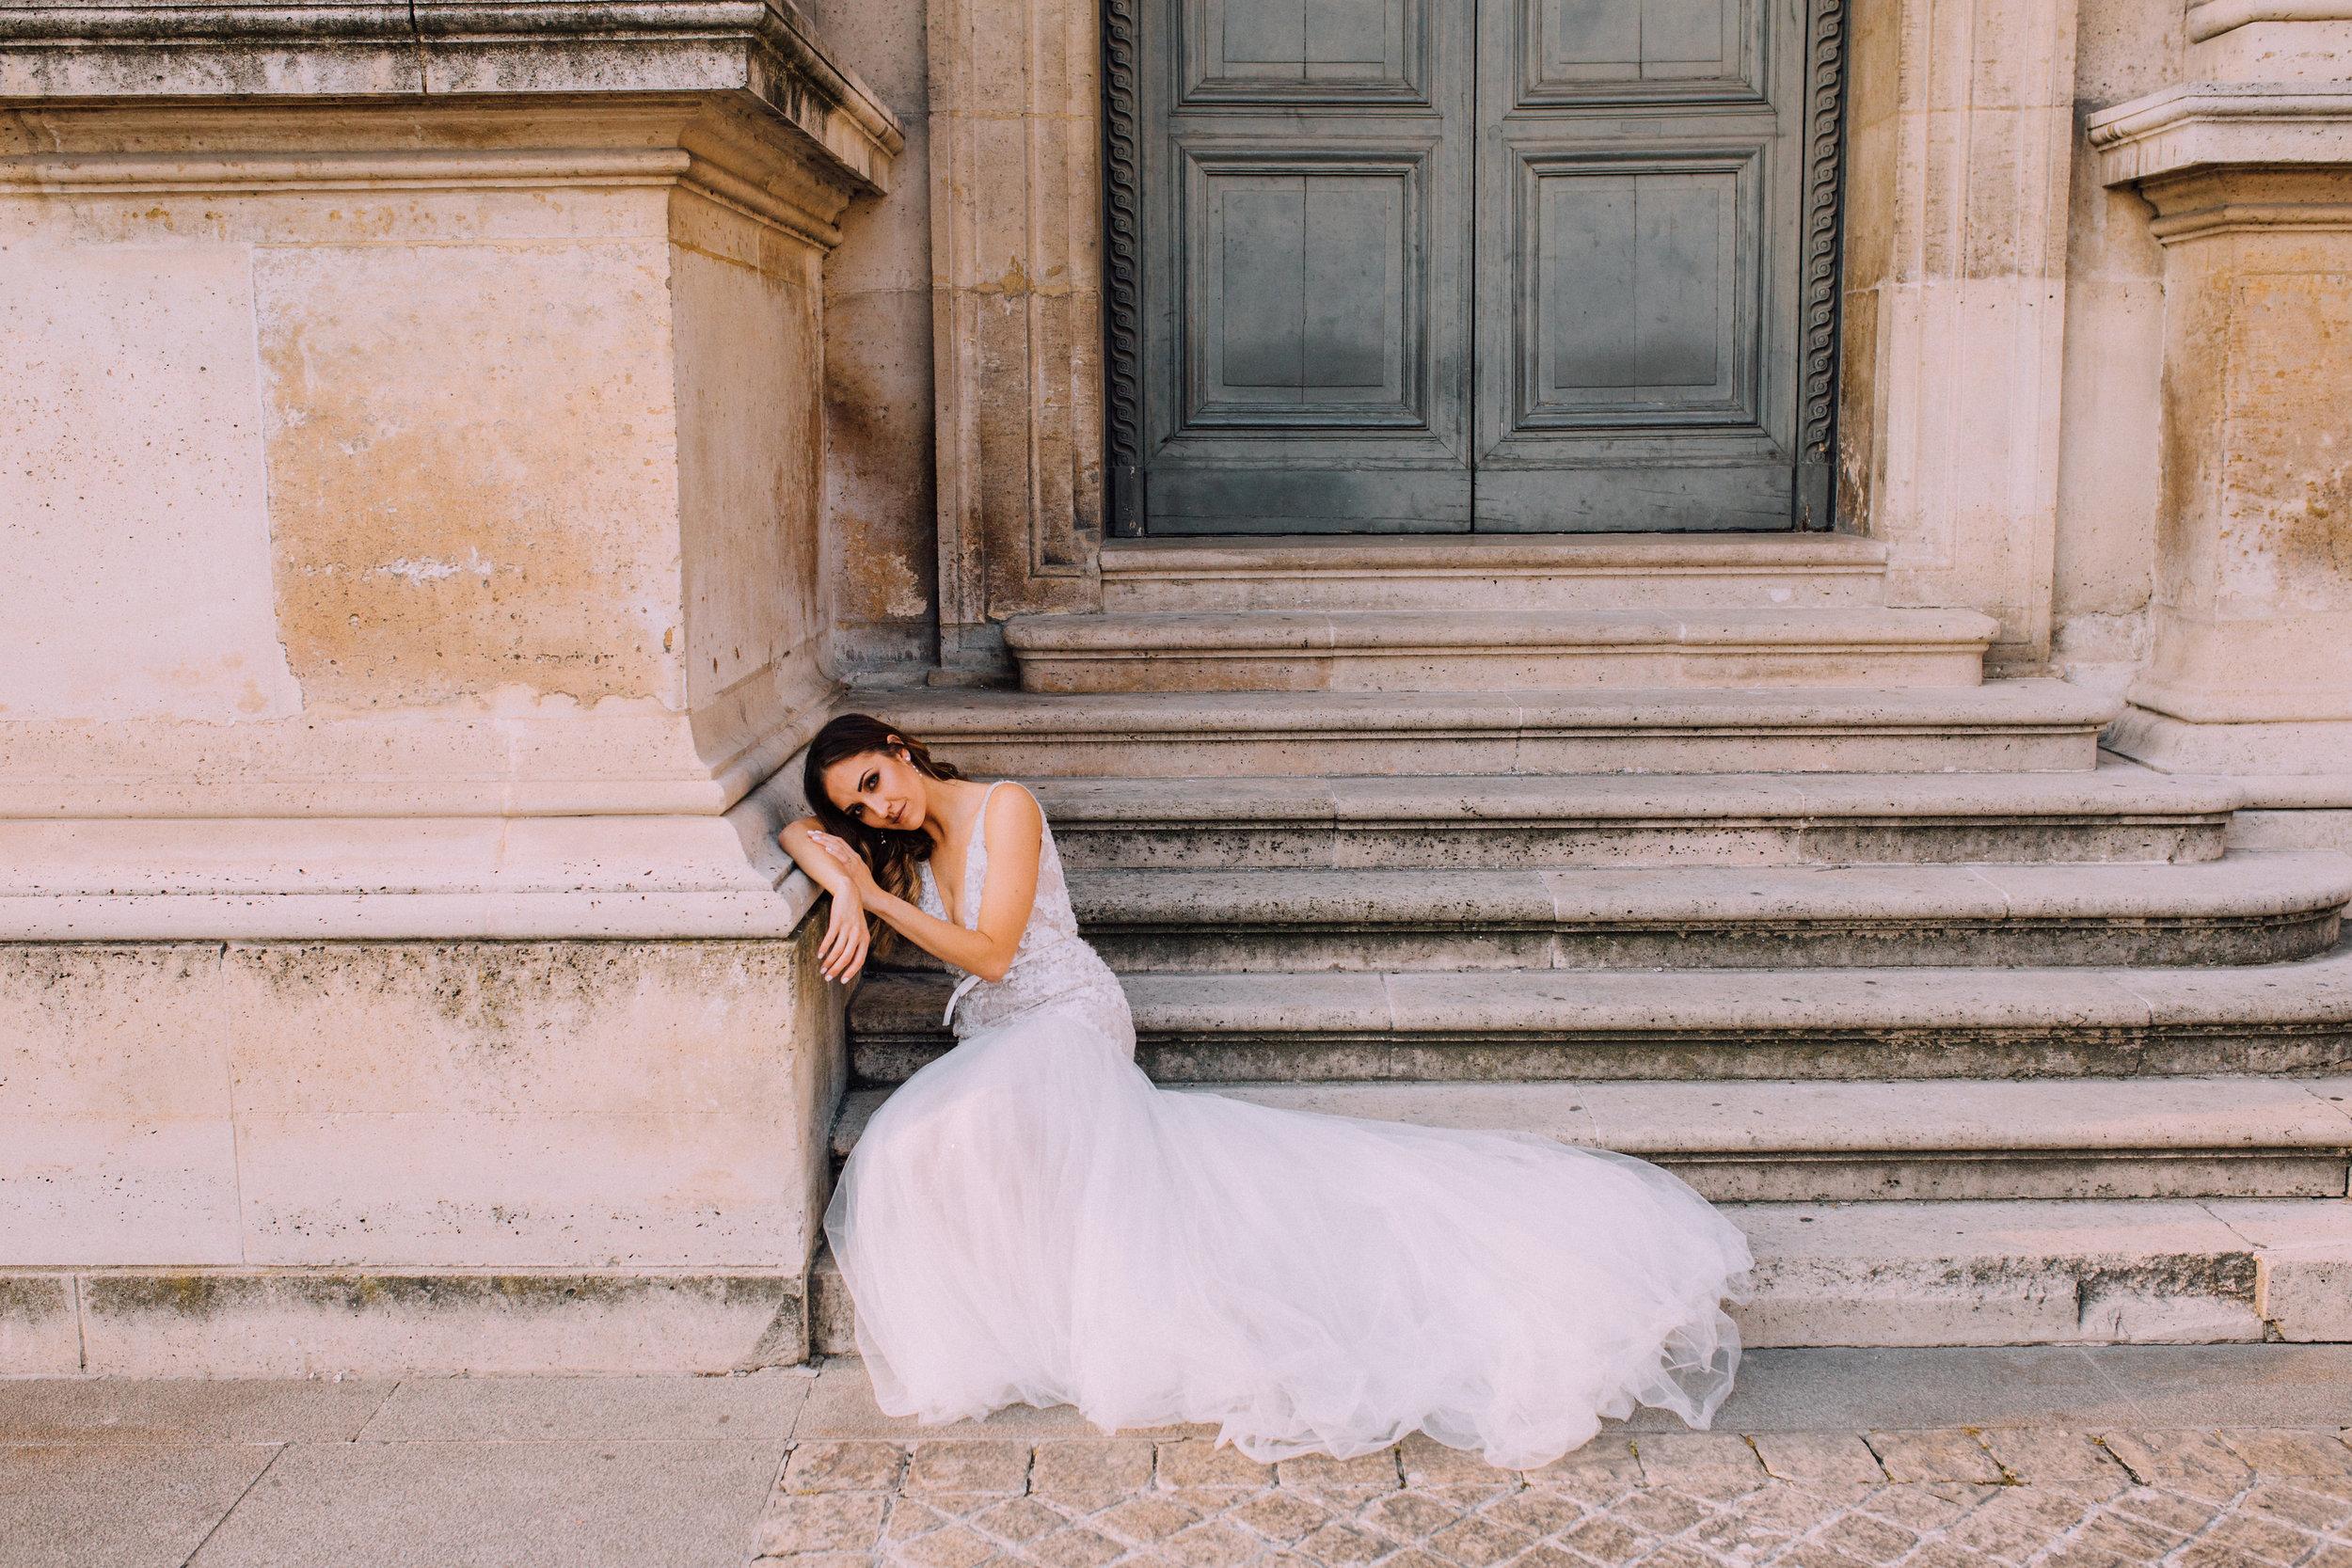 KUSJKA DU PLESSIS - Dress - Anna GeorginaModel - Samantha ClaasenJewellery - Marion RehwinkelLocation - Louvre Museum